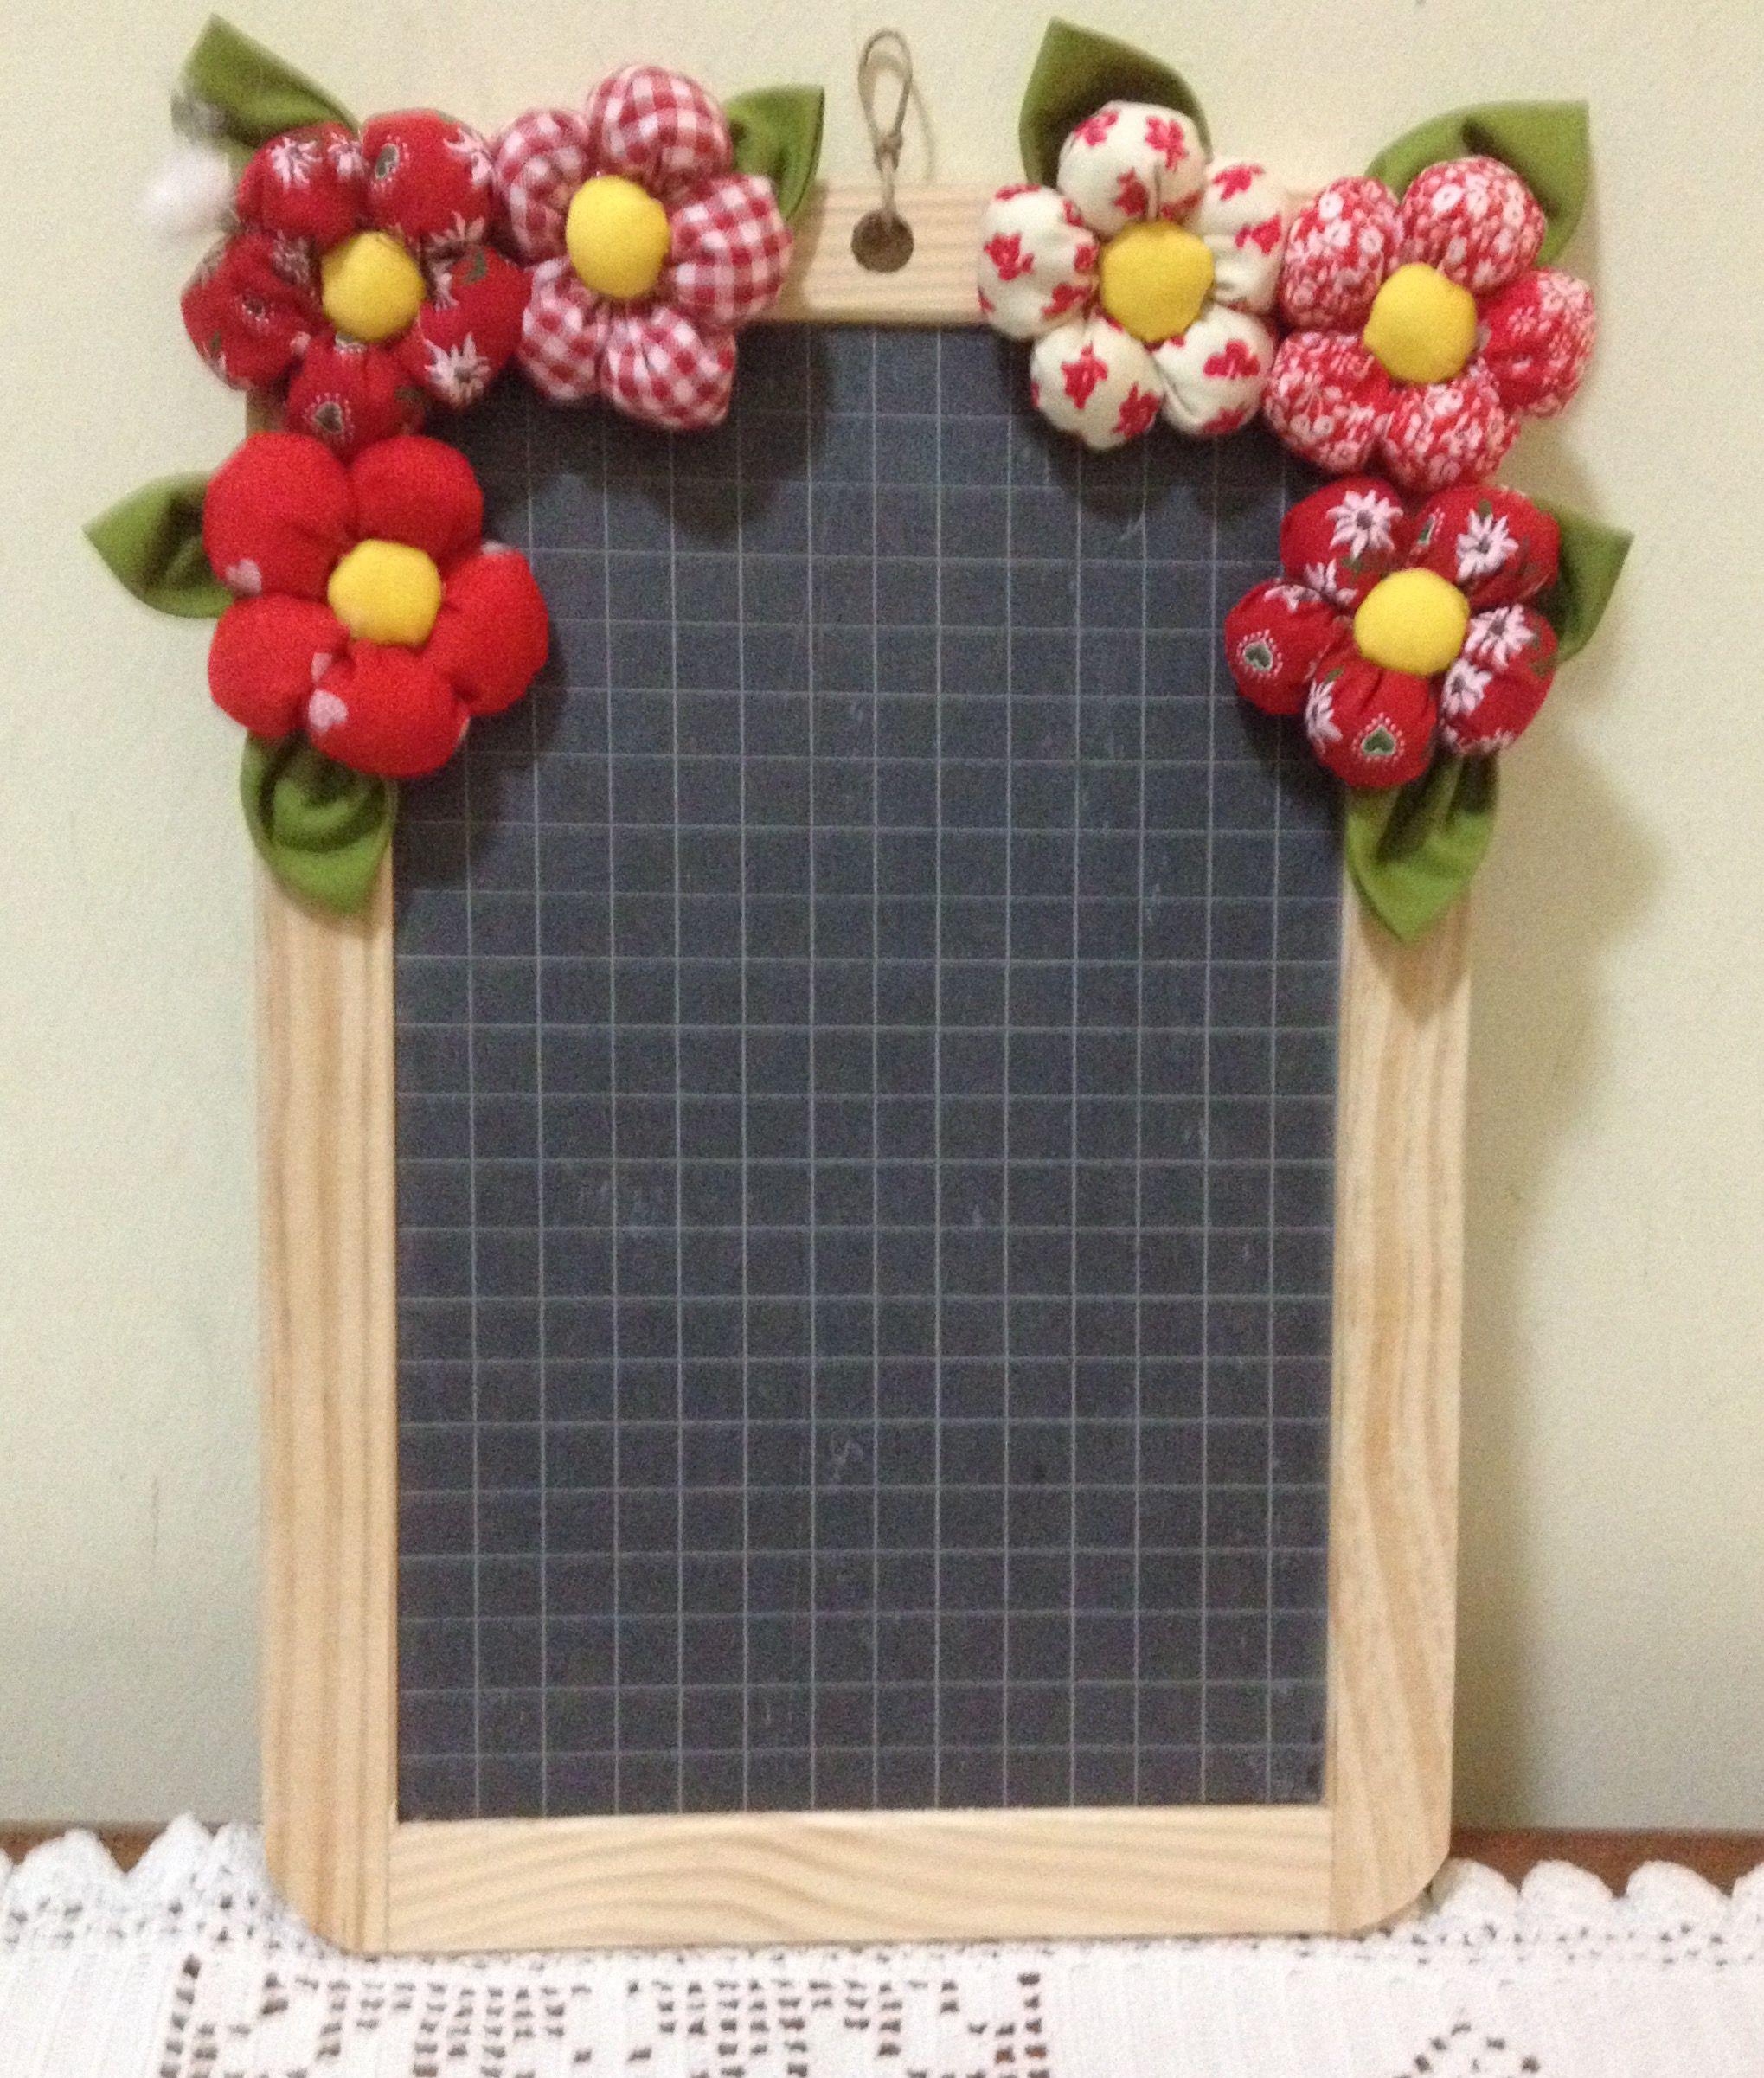 Lavagna decorata per cucina | portaretratos | Lavagnetta, Lavagna e ...